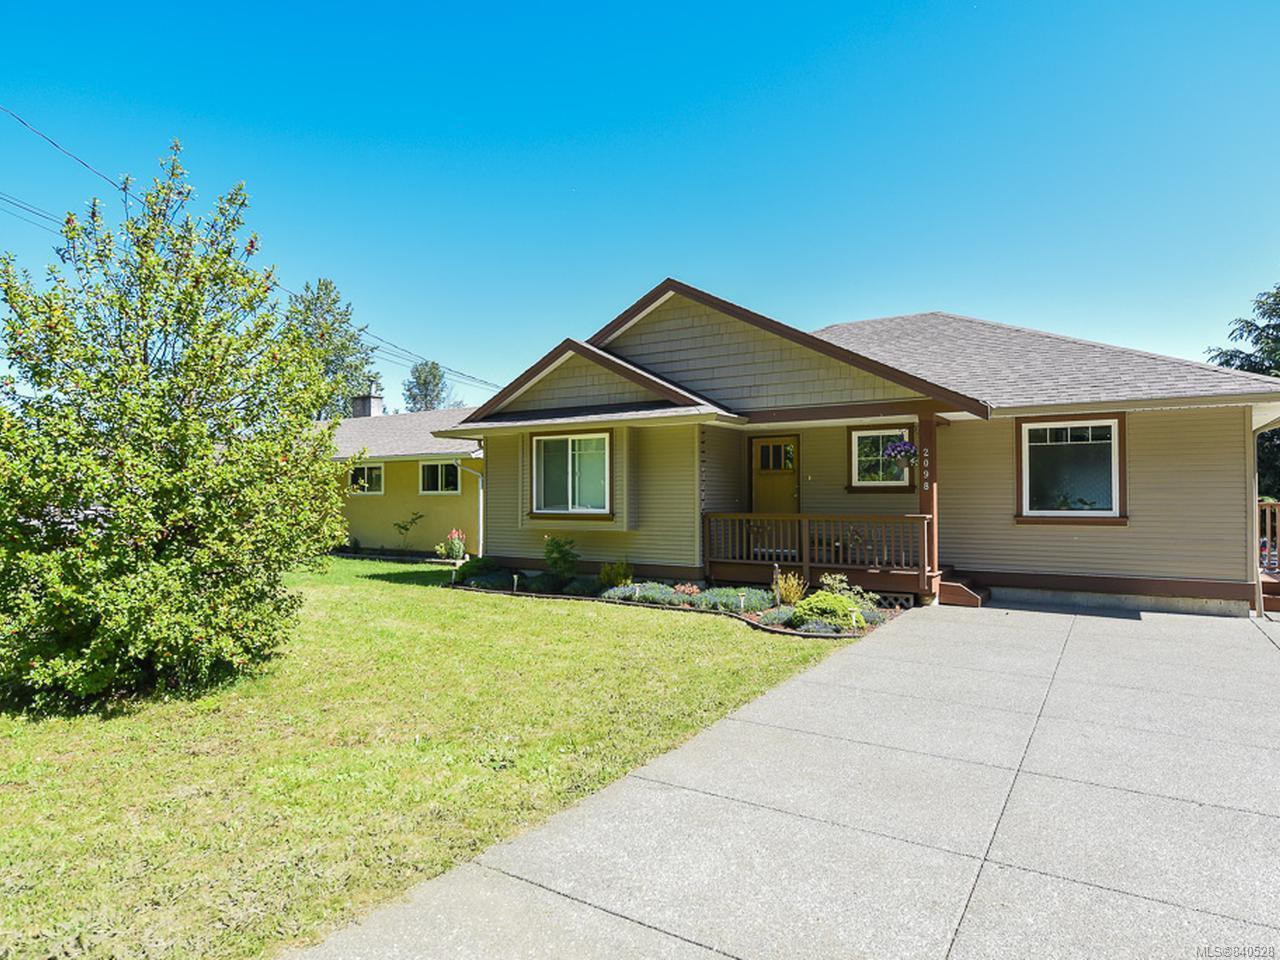 Main Photo: 2098 Arden Rd in COURTENAY: CV Courtenay City House for sale (Comox Valley)  : MLS®# 840528